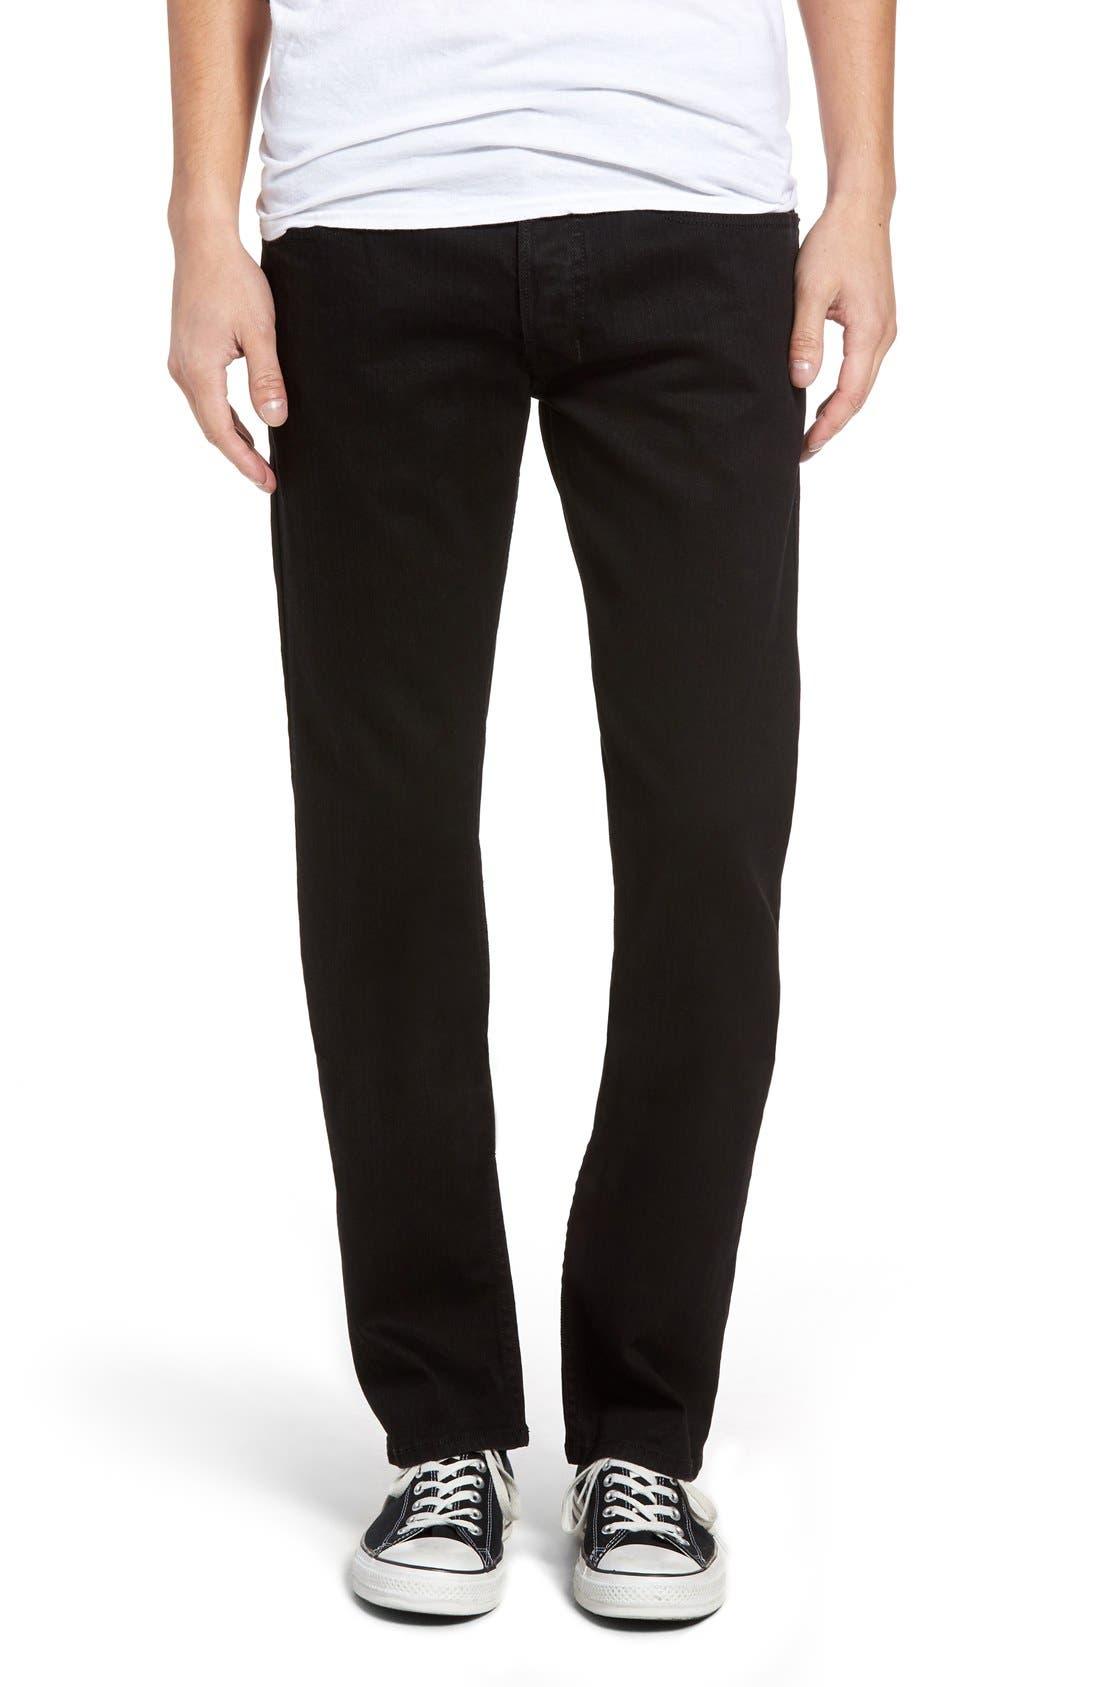 Alternate Image 1 Selected - DIESEL® Safado Slim Fit Jeans (Z886)